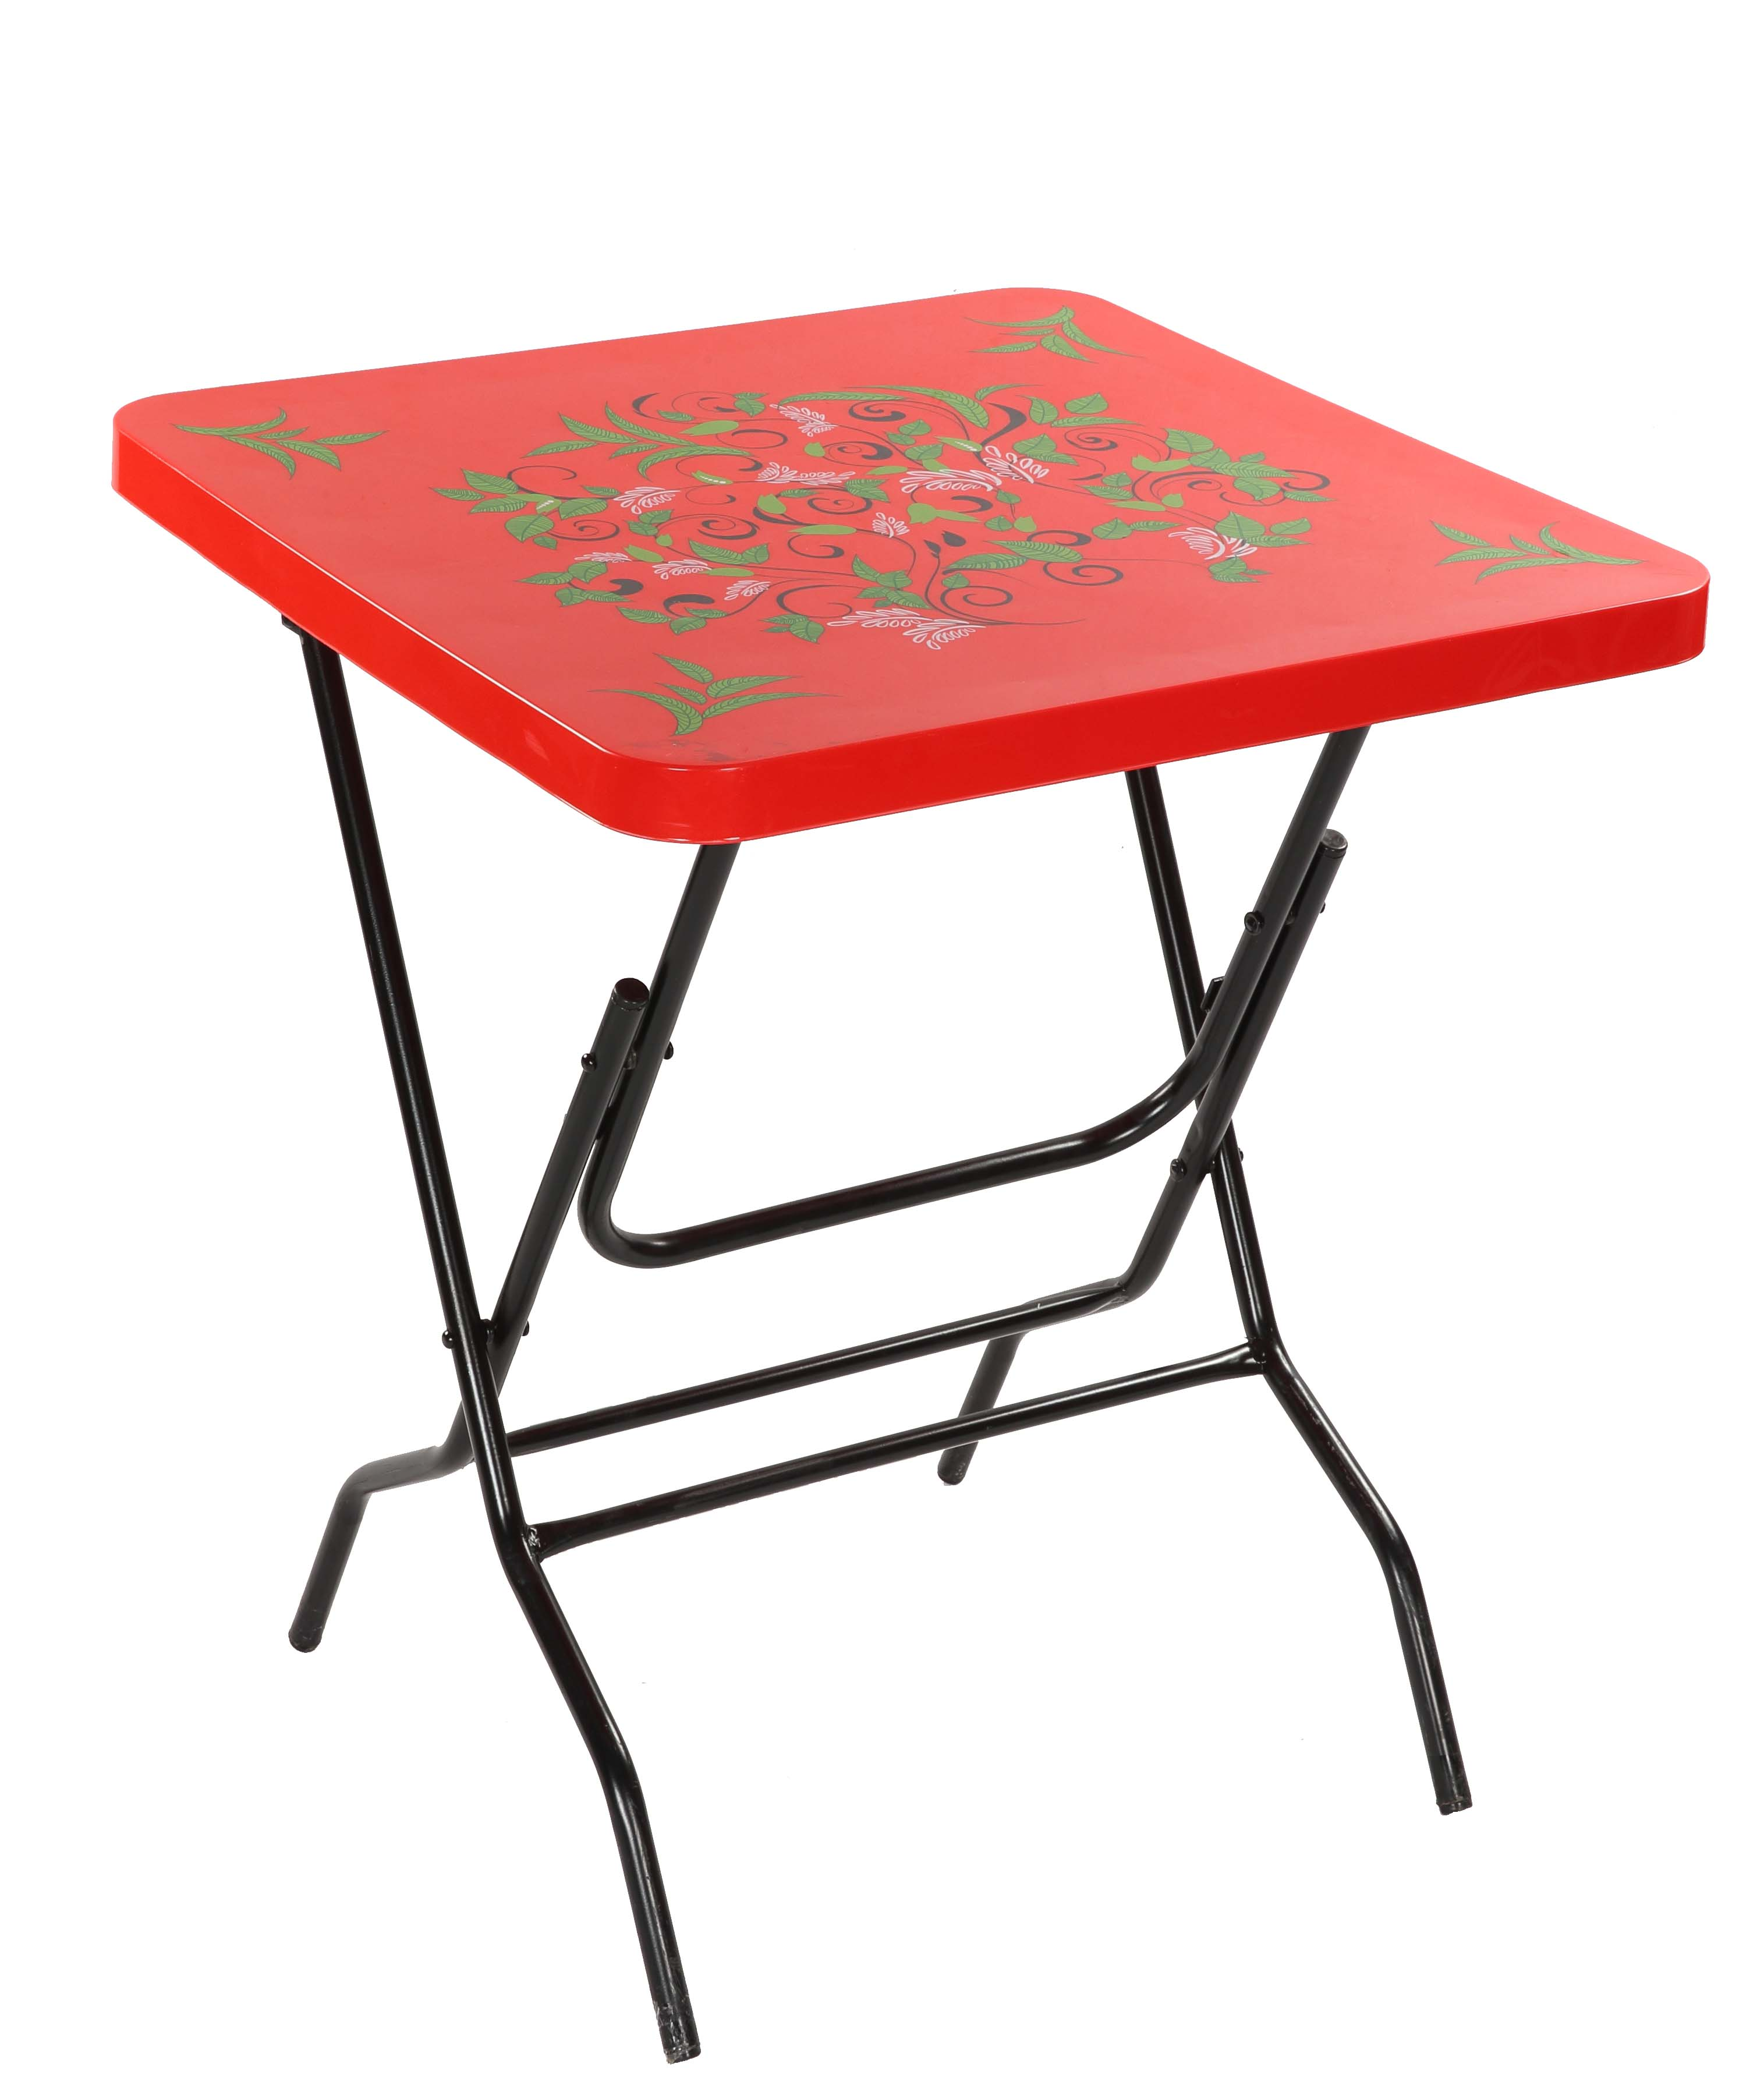 Royal Coffee Table(Printed)Red